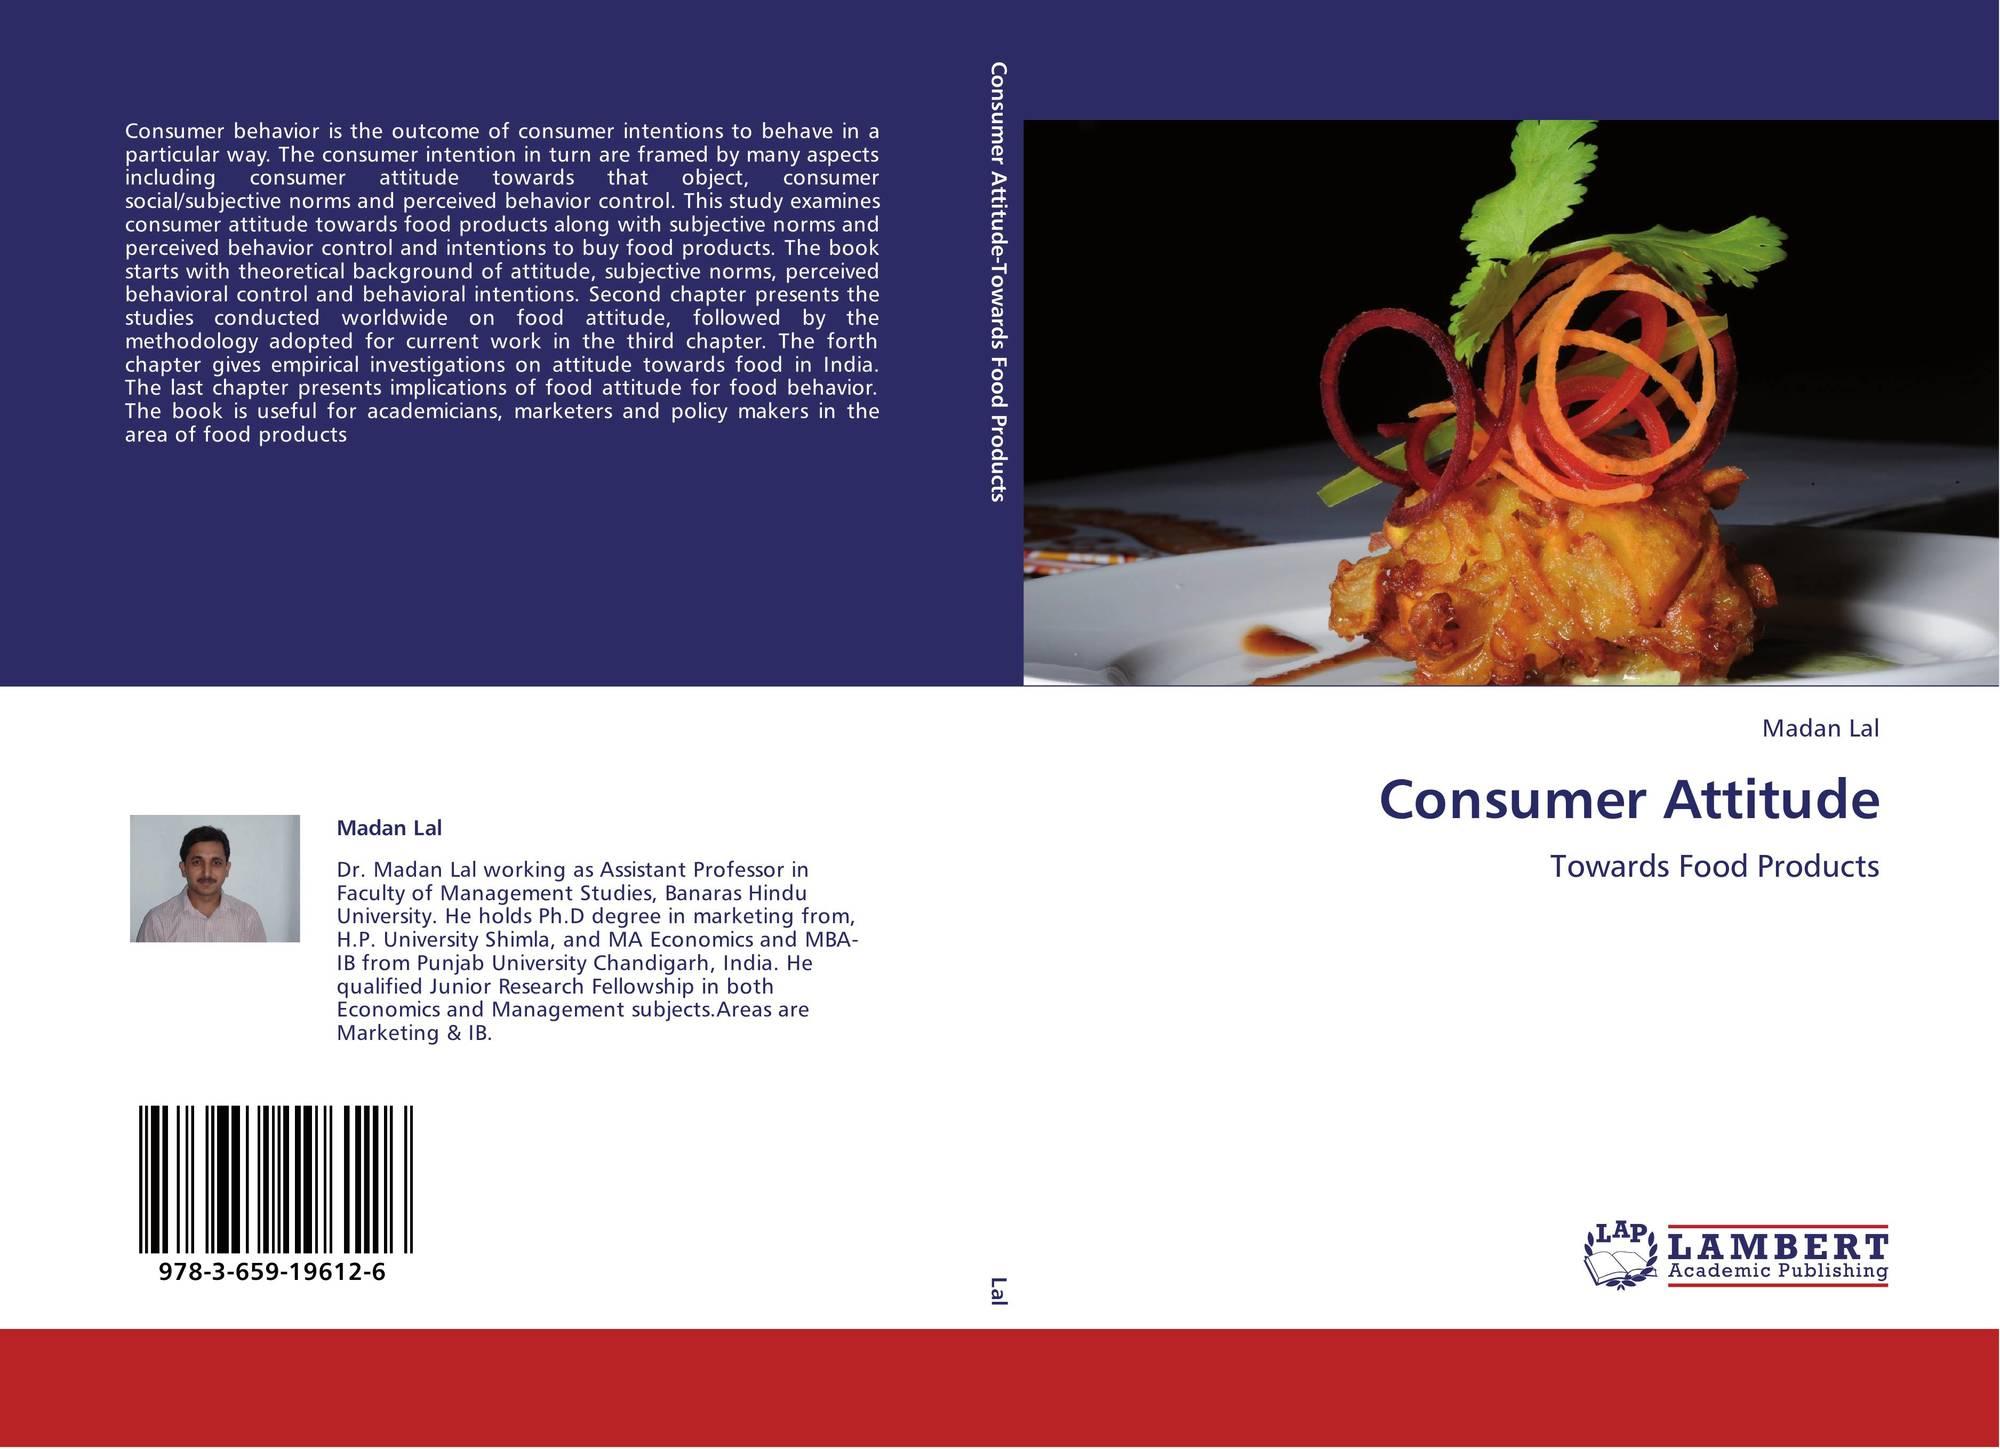 malaysian attitudes towards counterfeits of luxury brands (2008) cypriot consumer behaviour towards luxury brands  consumers brand relationships and attitudes towards  at university of nottingham malaysian.